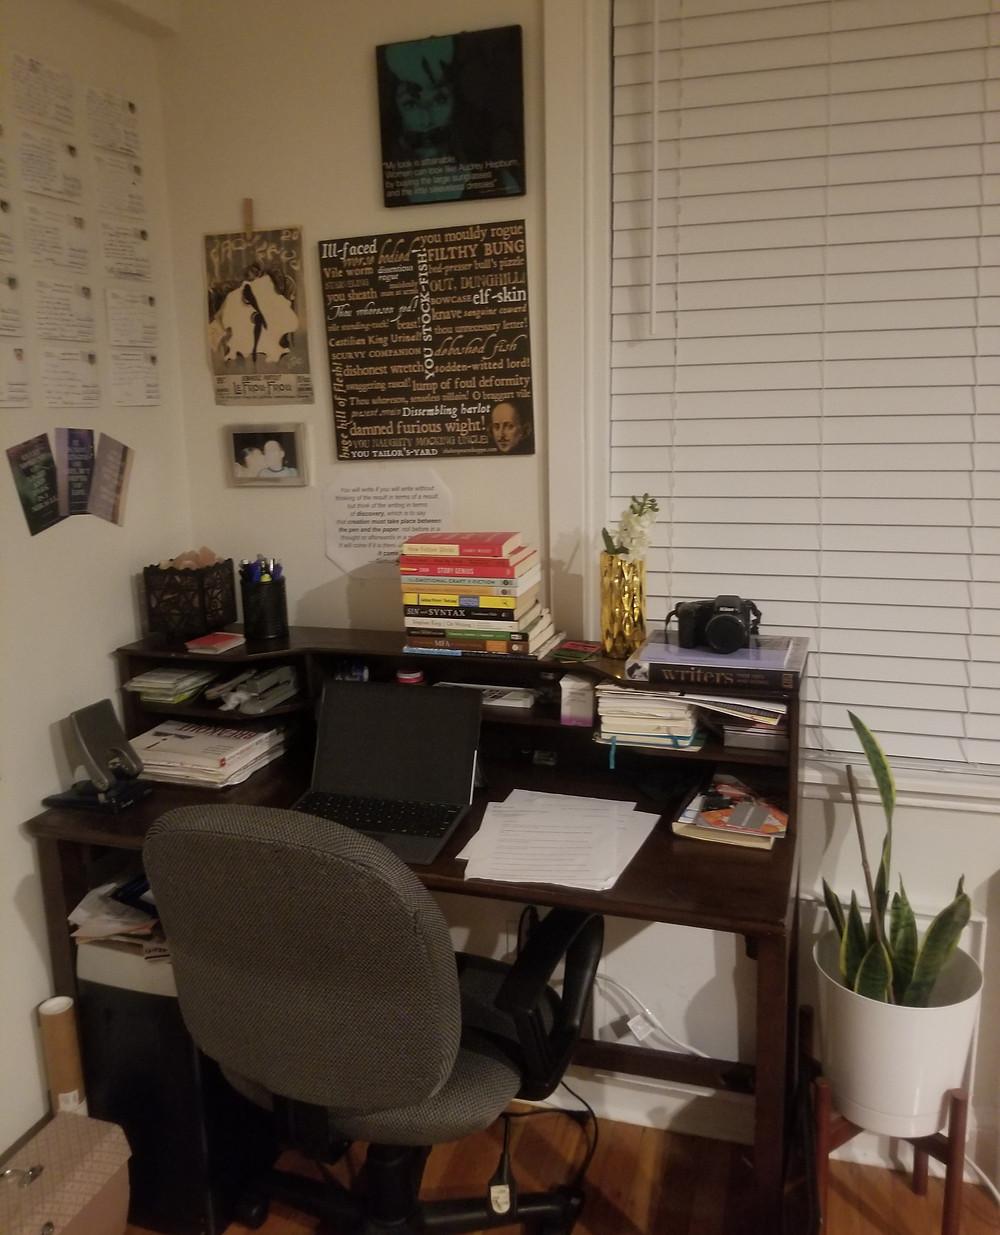 Rayna's workspace